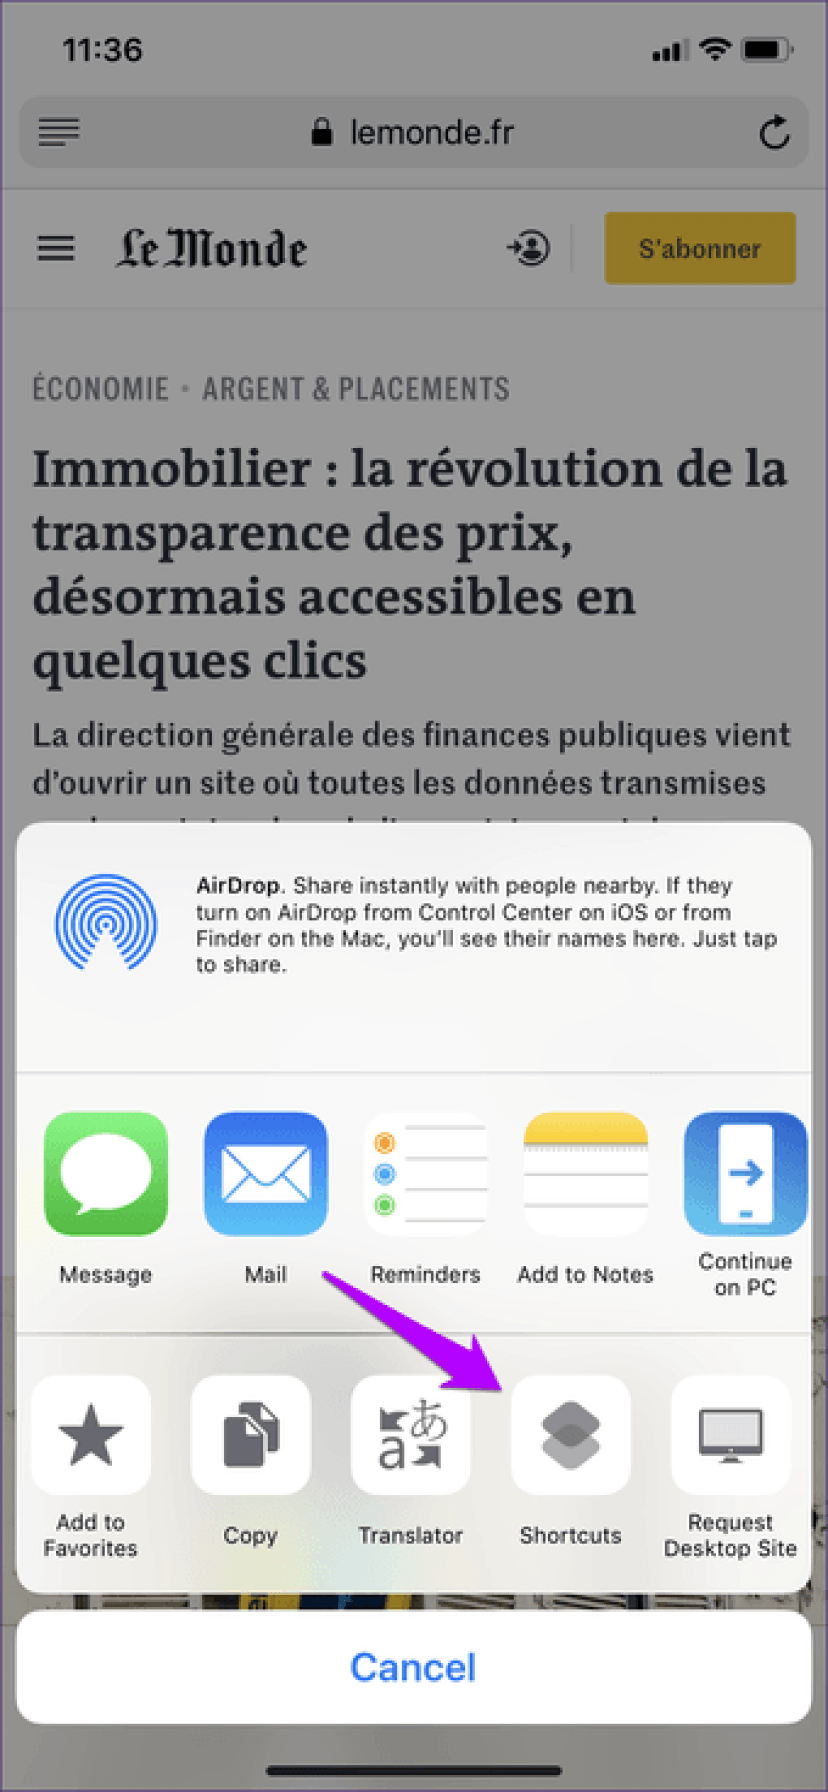 Iphone Ipad Translate Languages 12